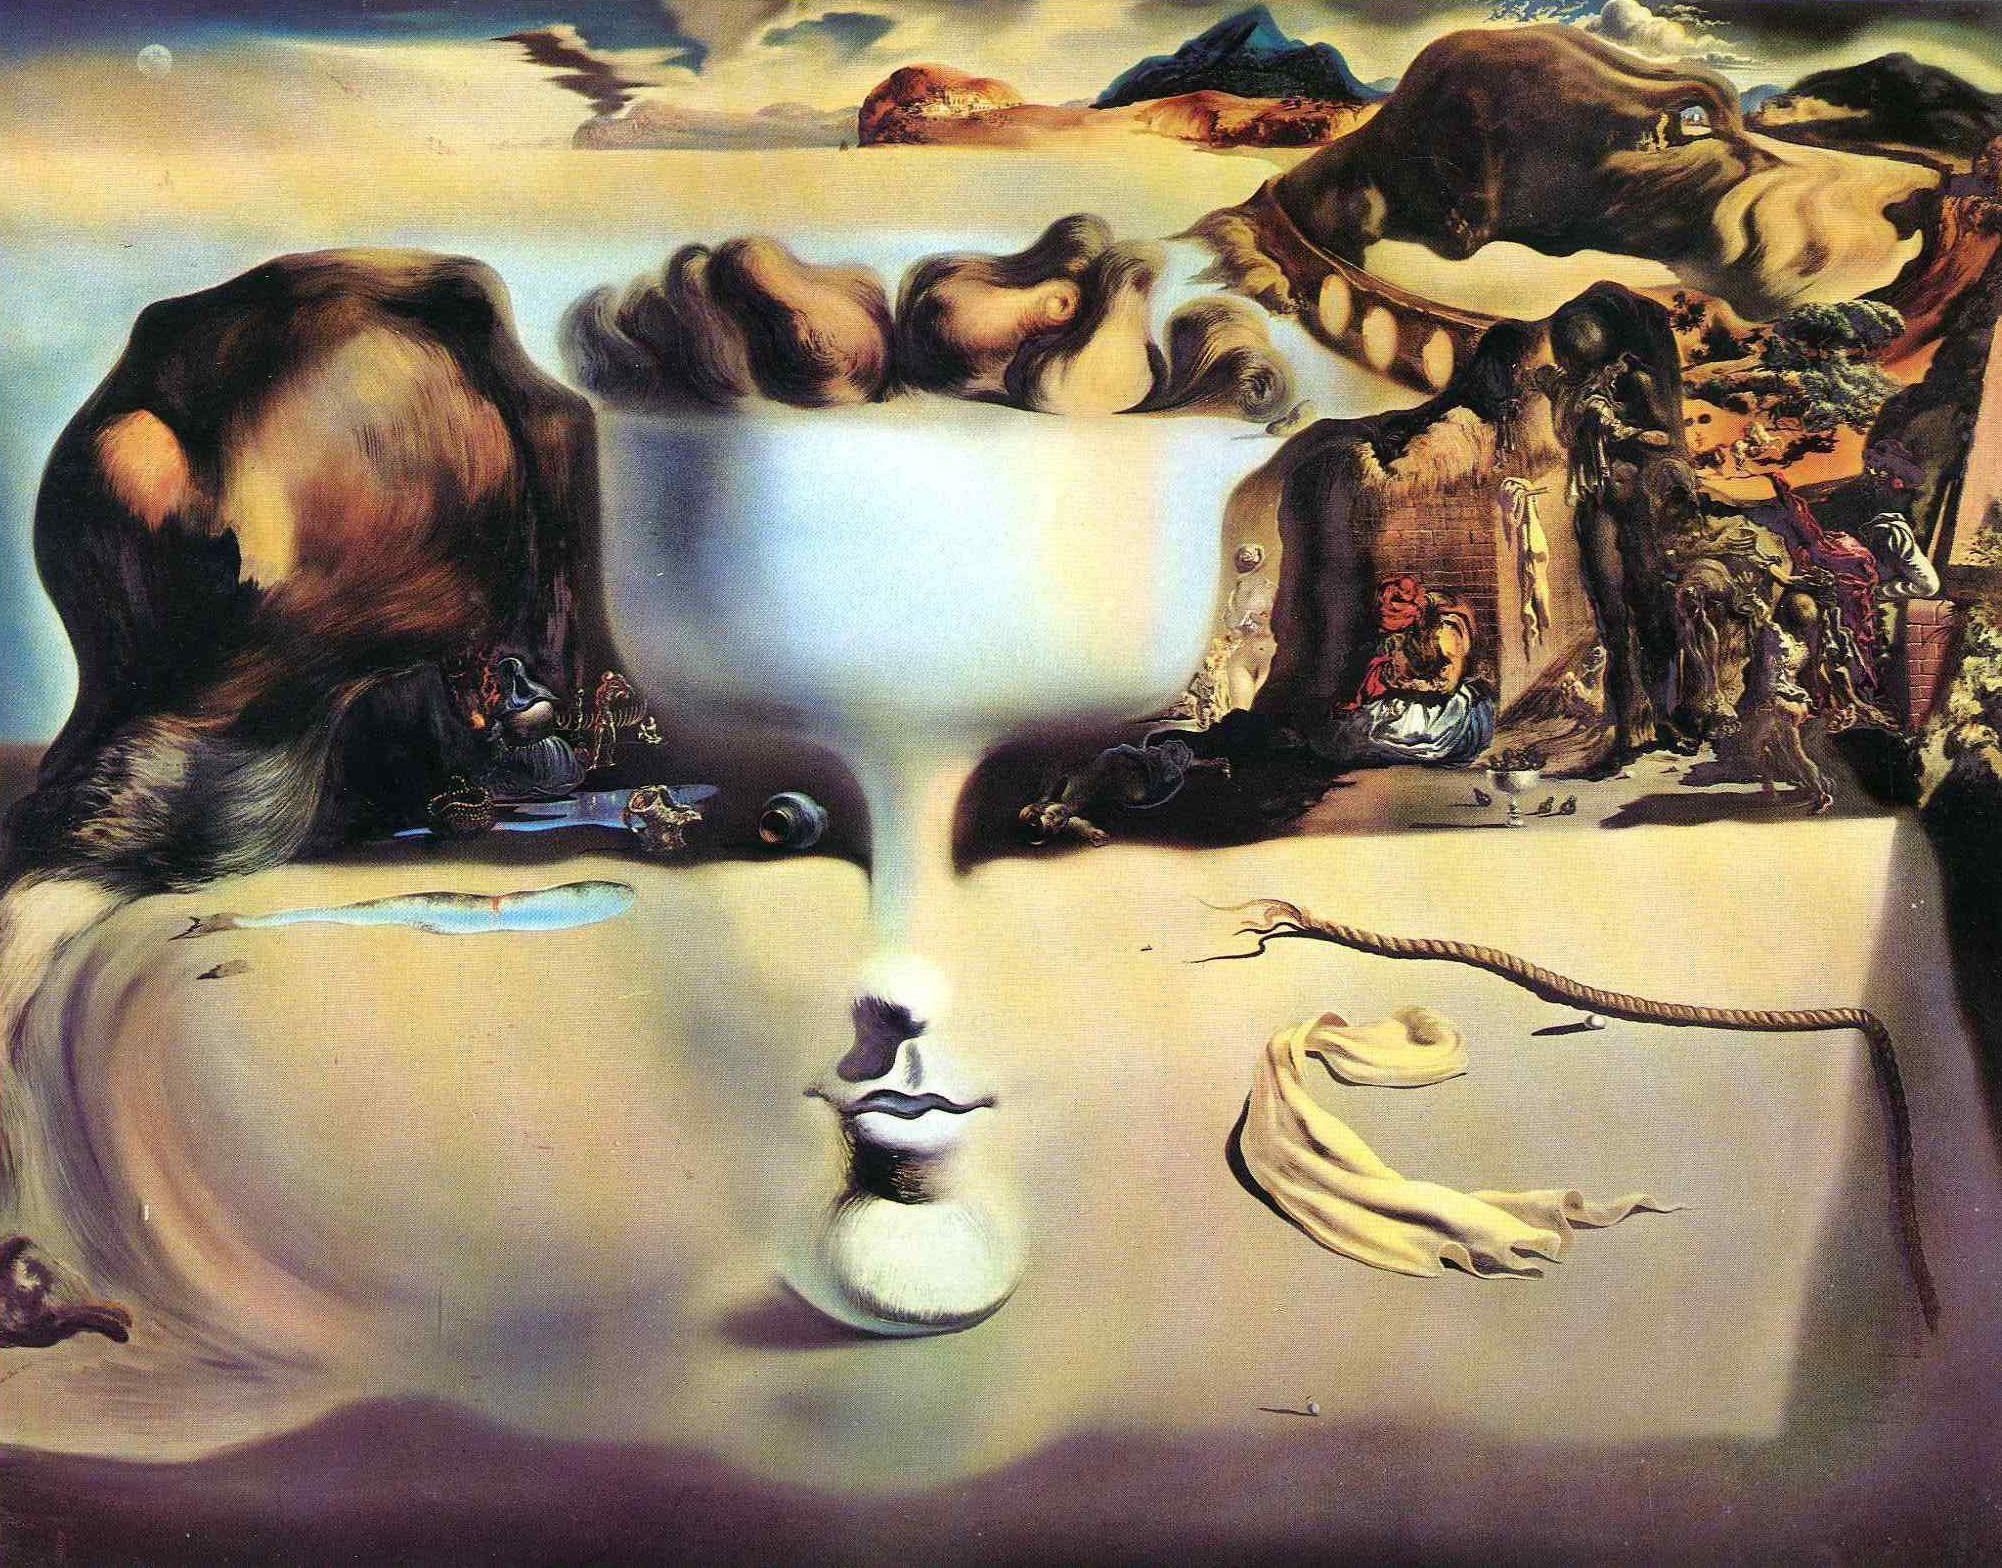 1000+ images about Salvador Dali on Pinterest | Vladimir kush ...